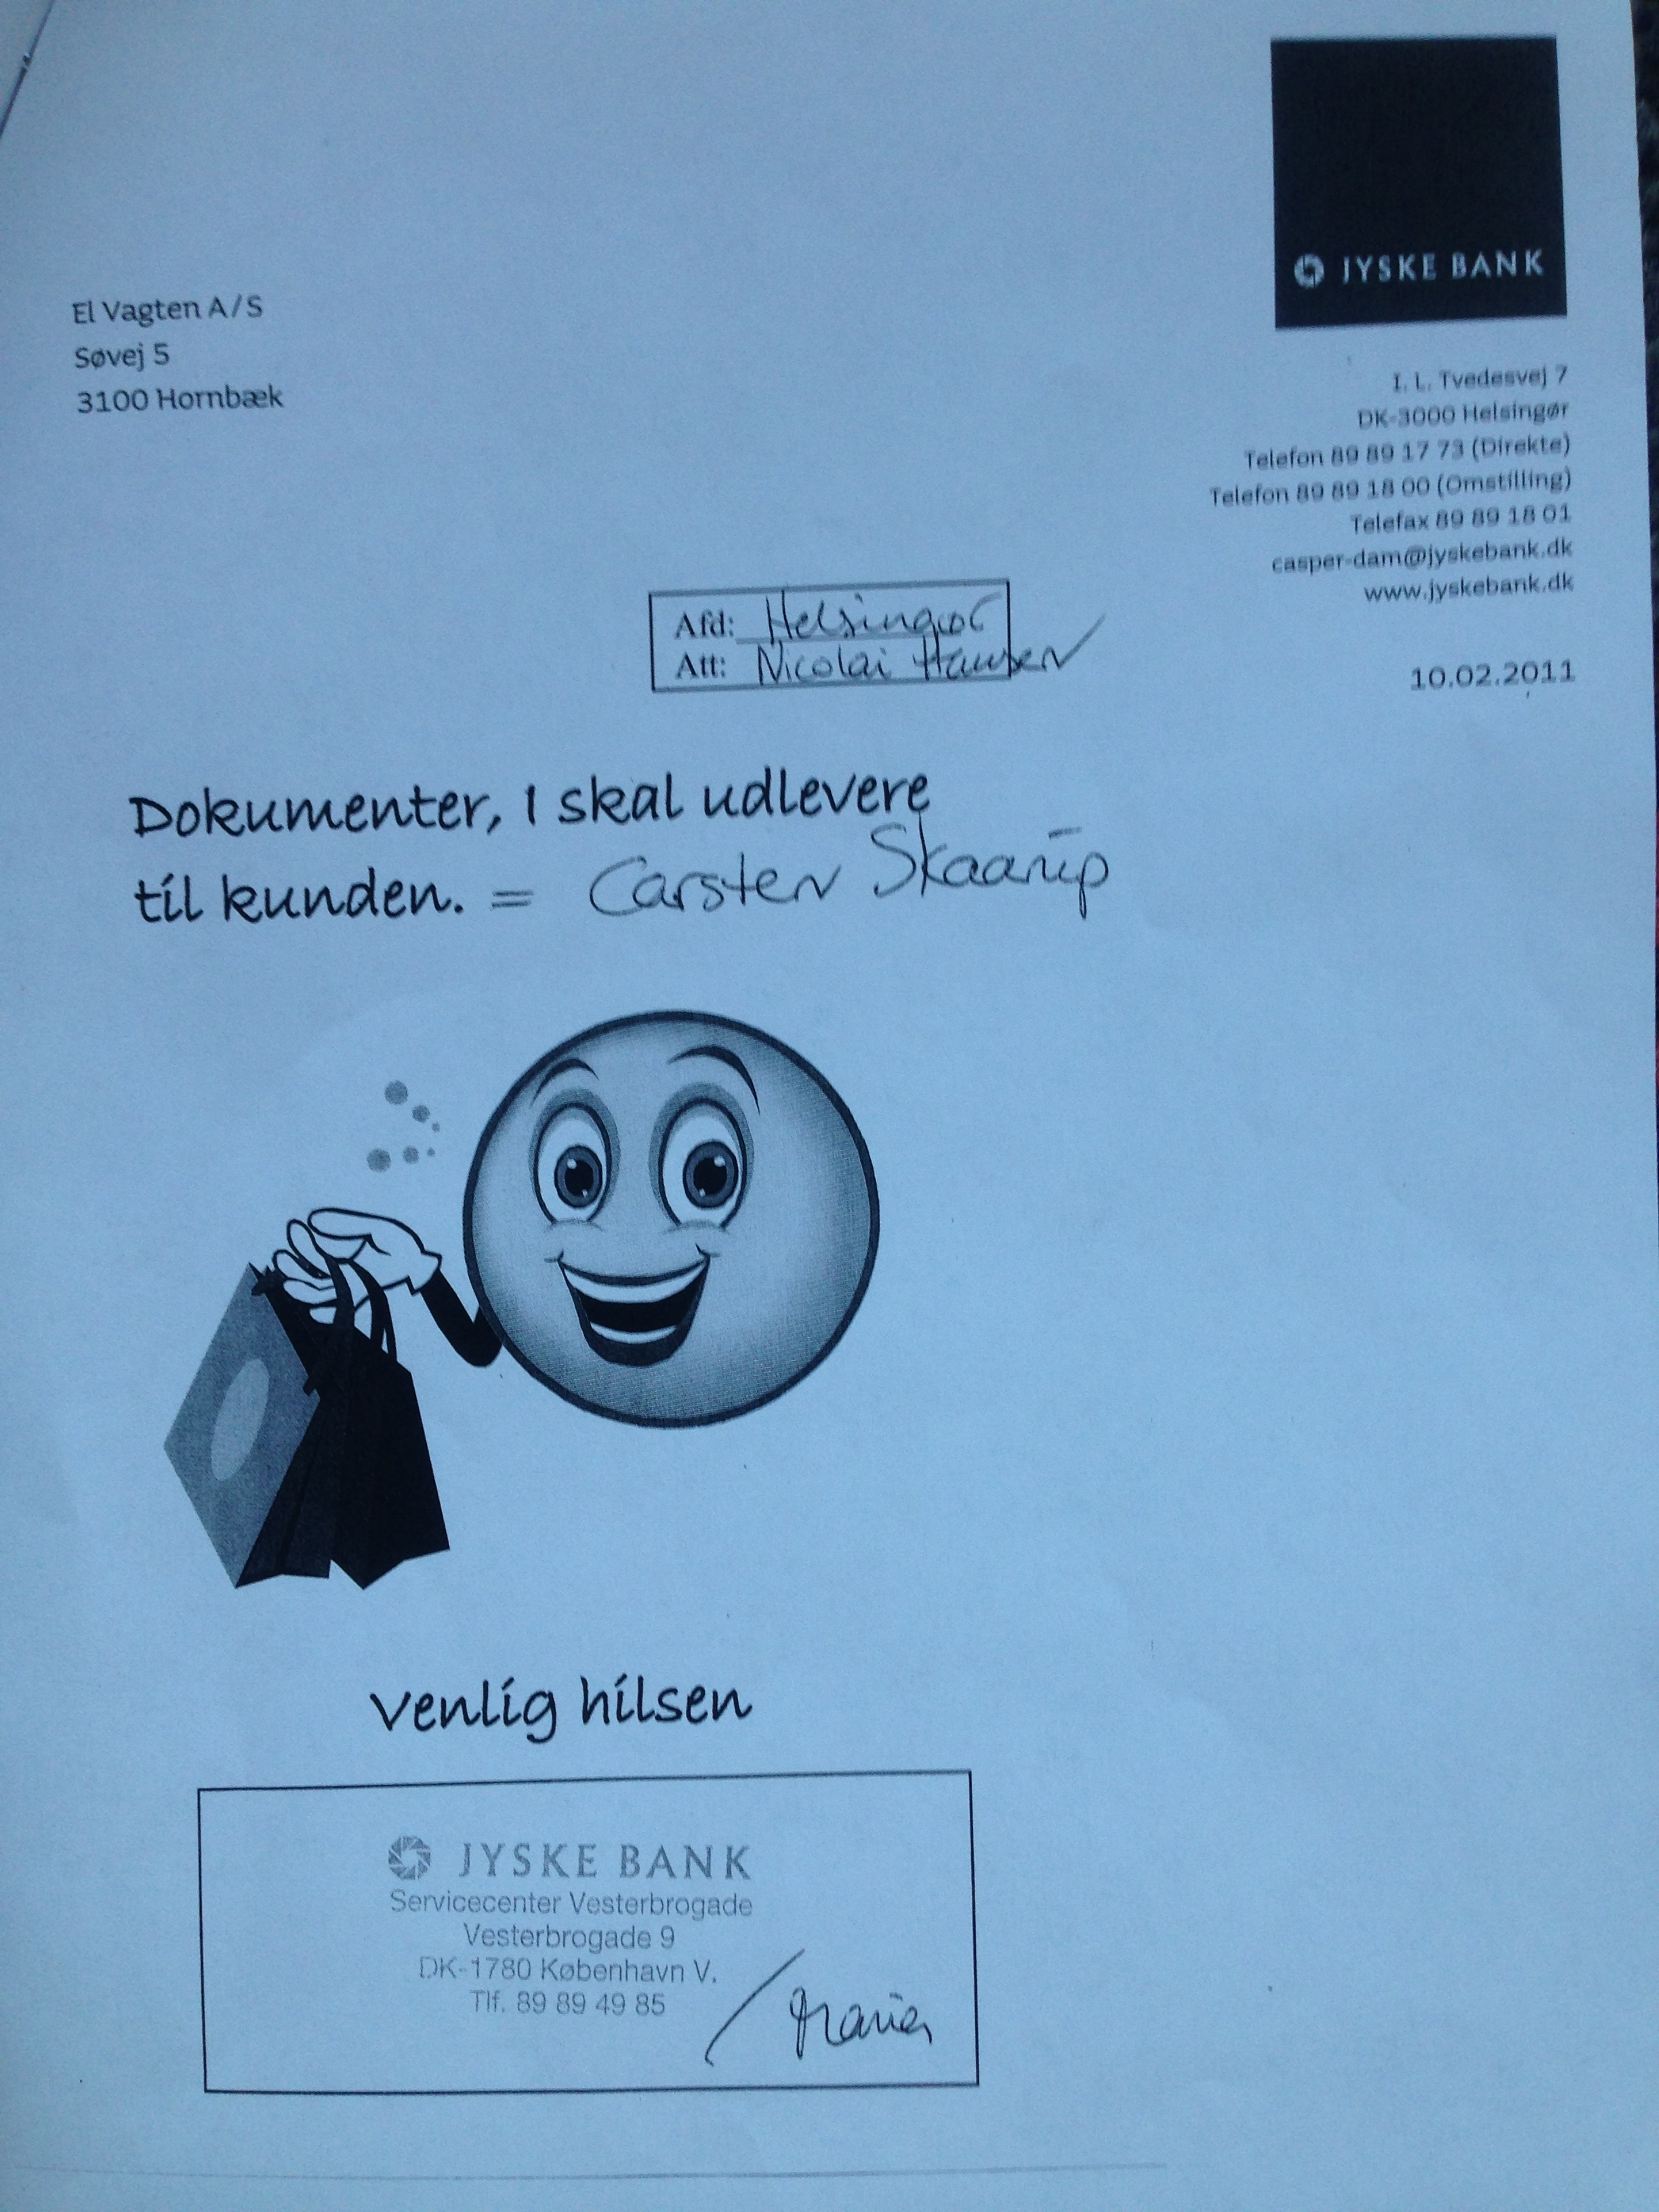 var skriver man in vinnar mail